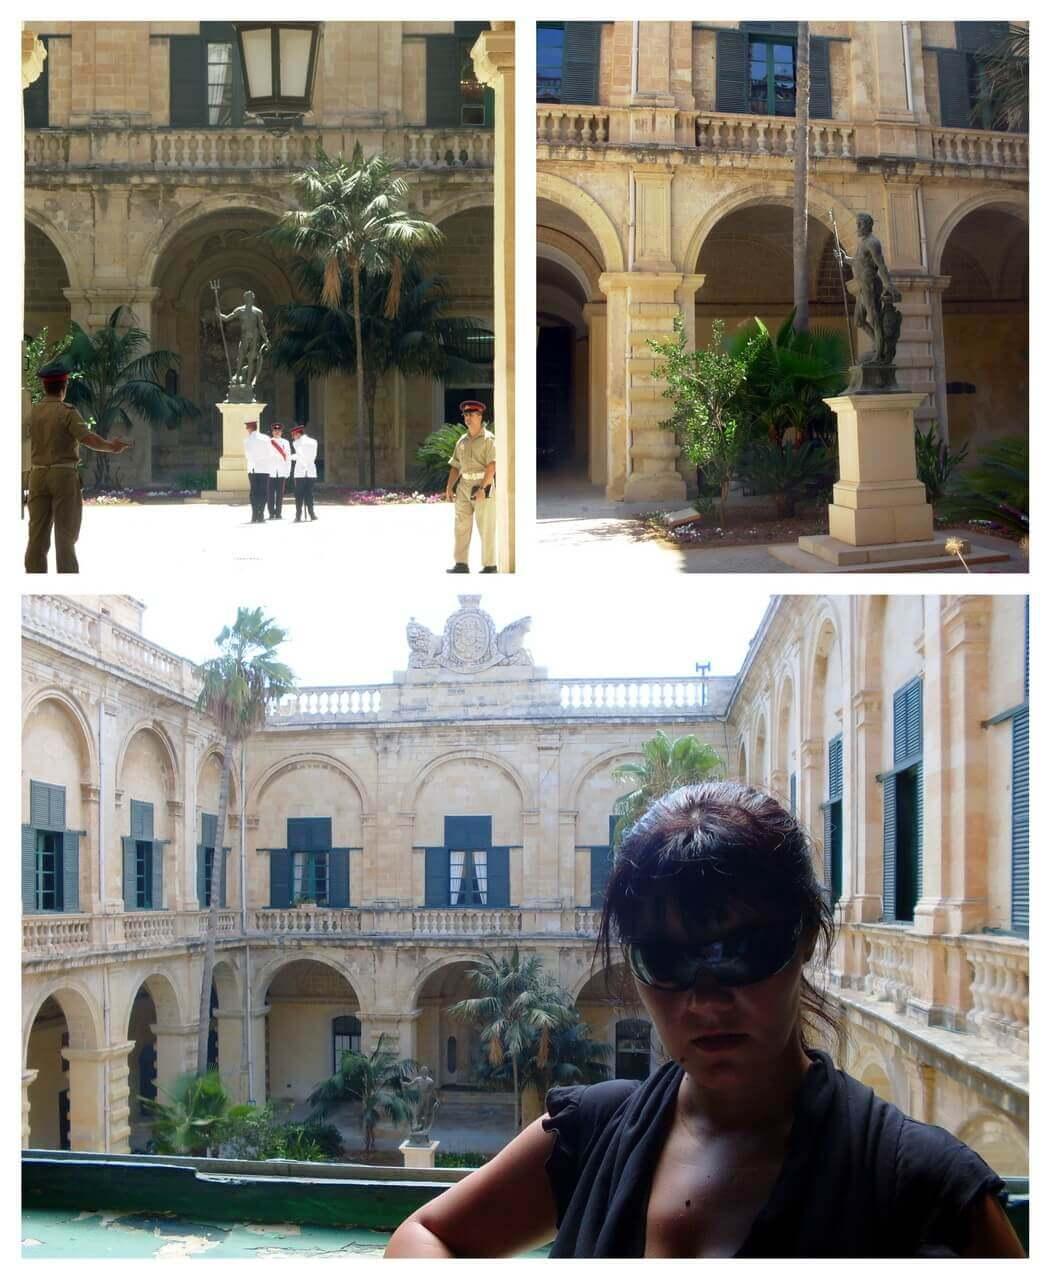 Valletta, Grand Master's Palace, courtyard